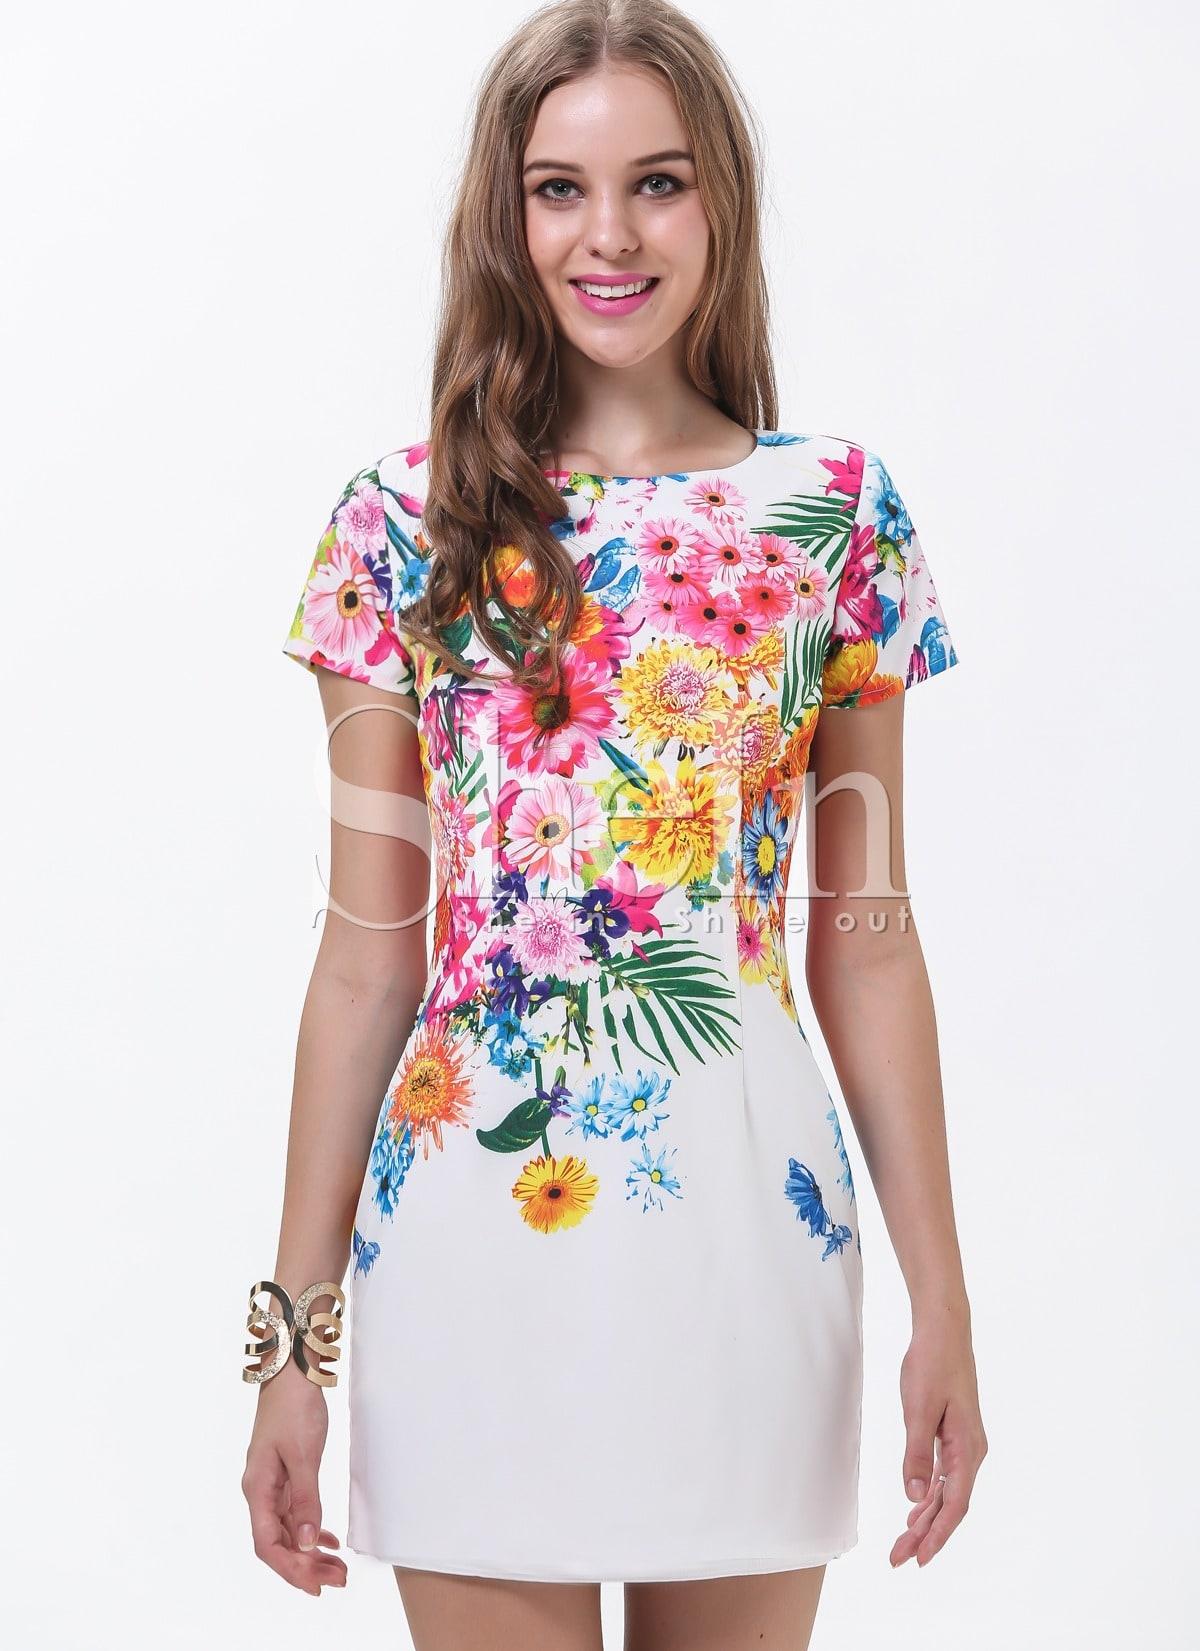 531e4529e2 White Short Sleeve Patterned Florals Print Pastel Dress | SHEIN